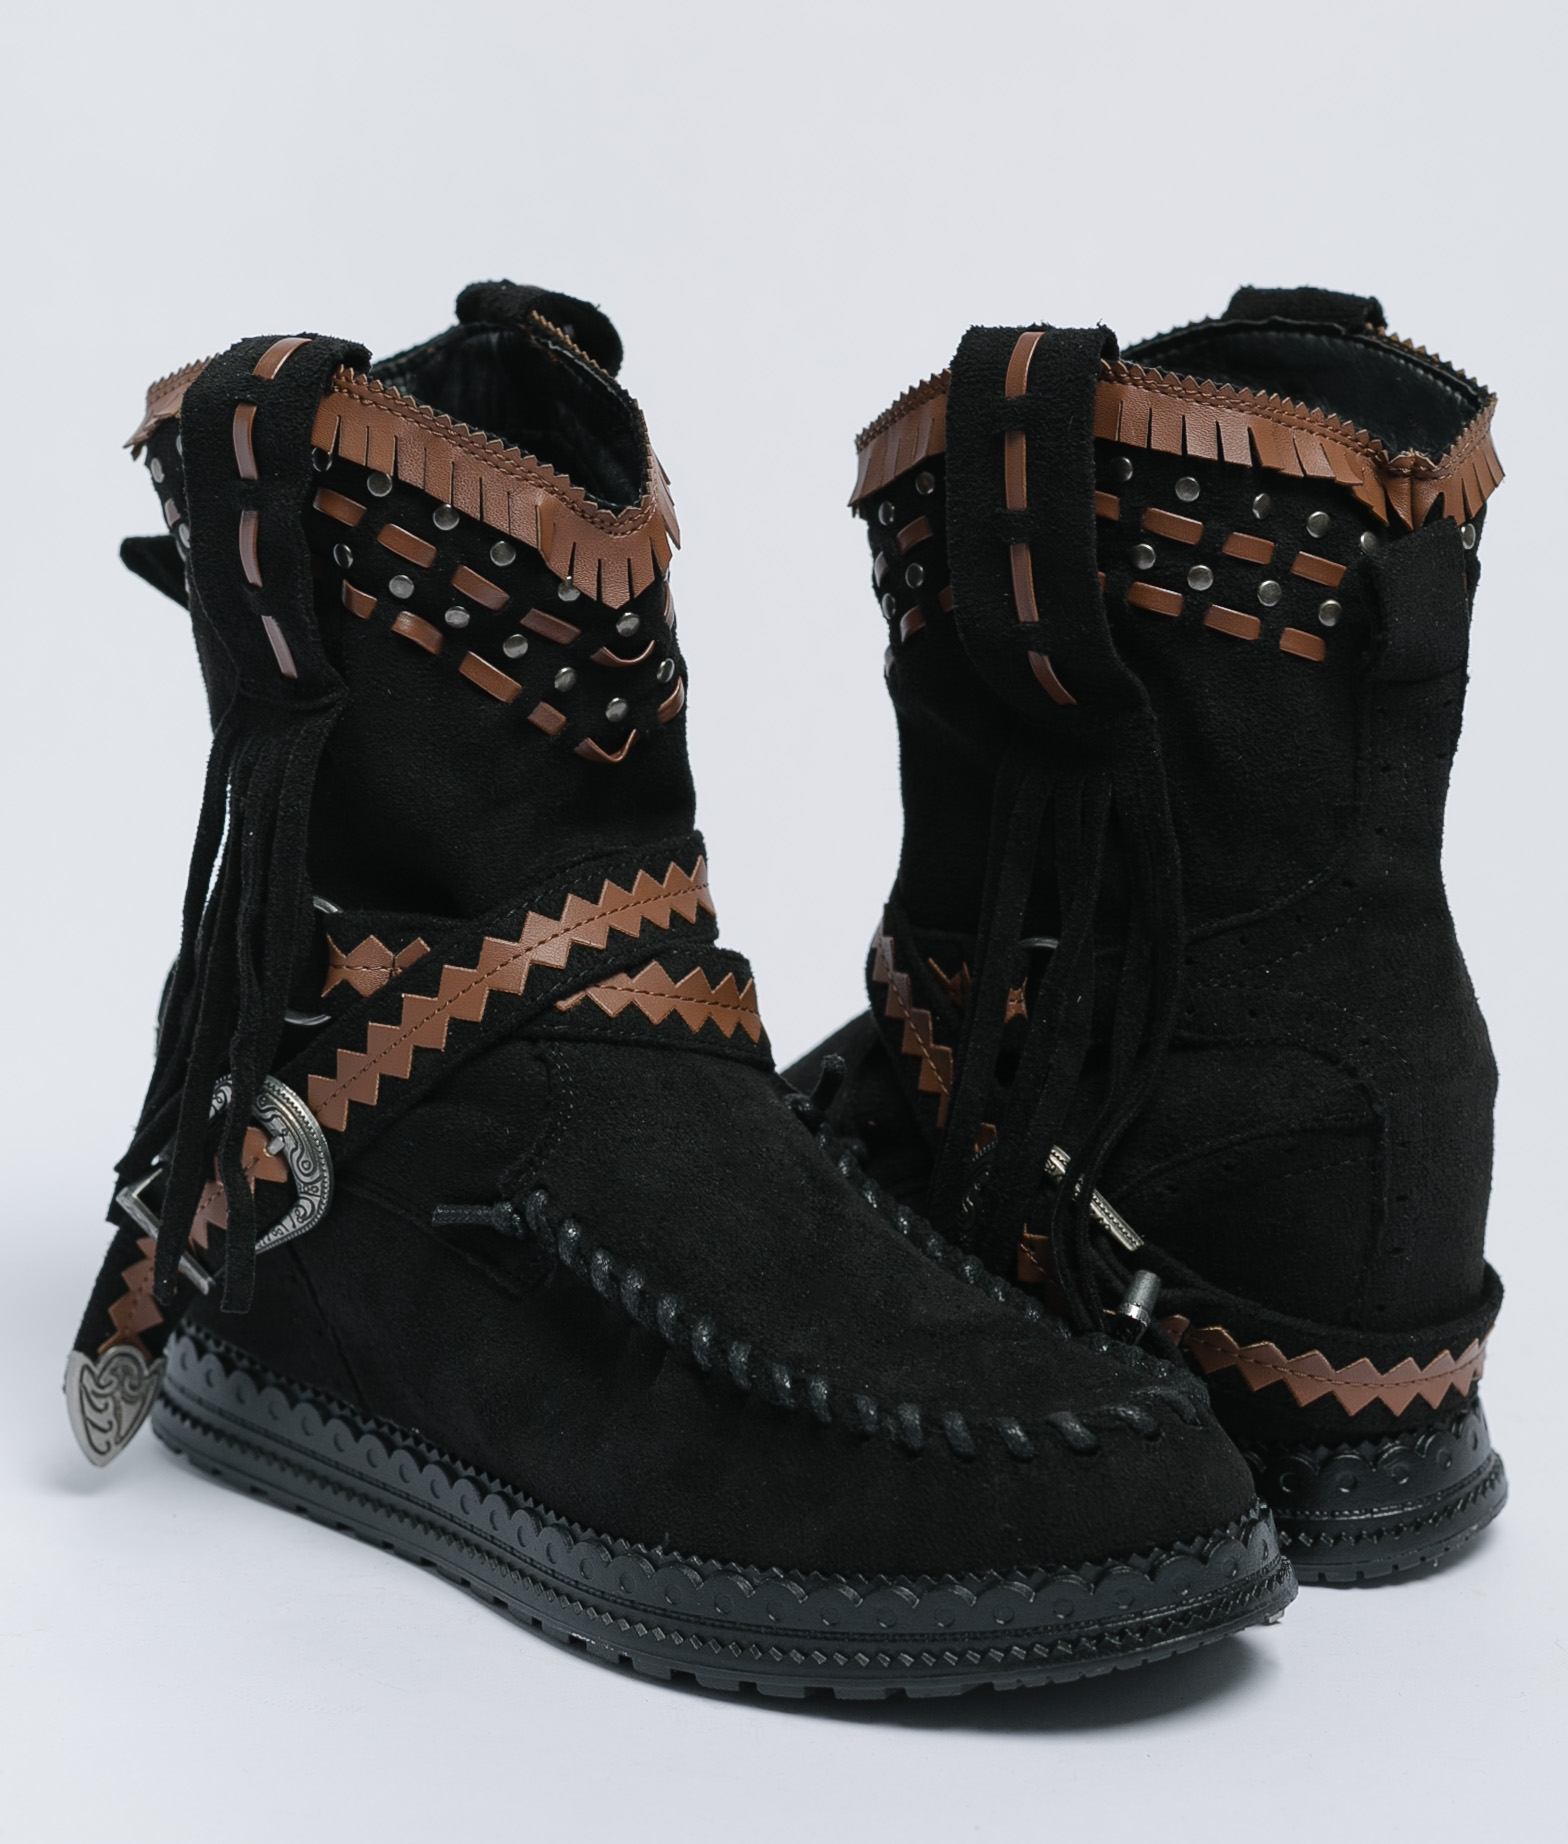 Bota Baja Indianini Korian - Negro